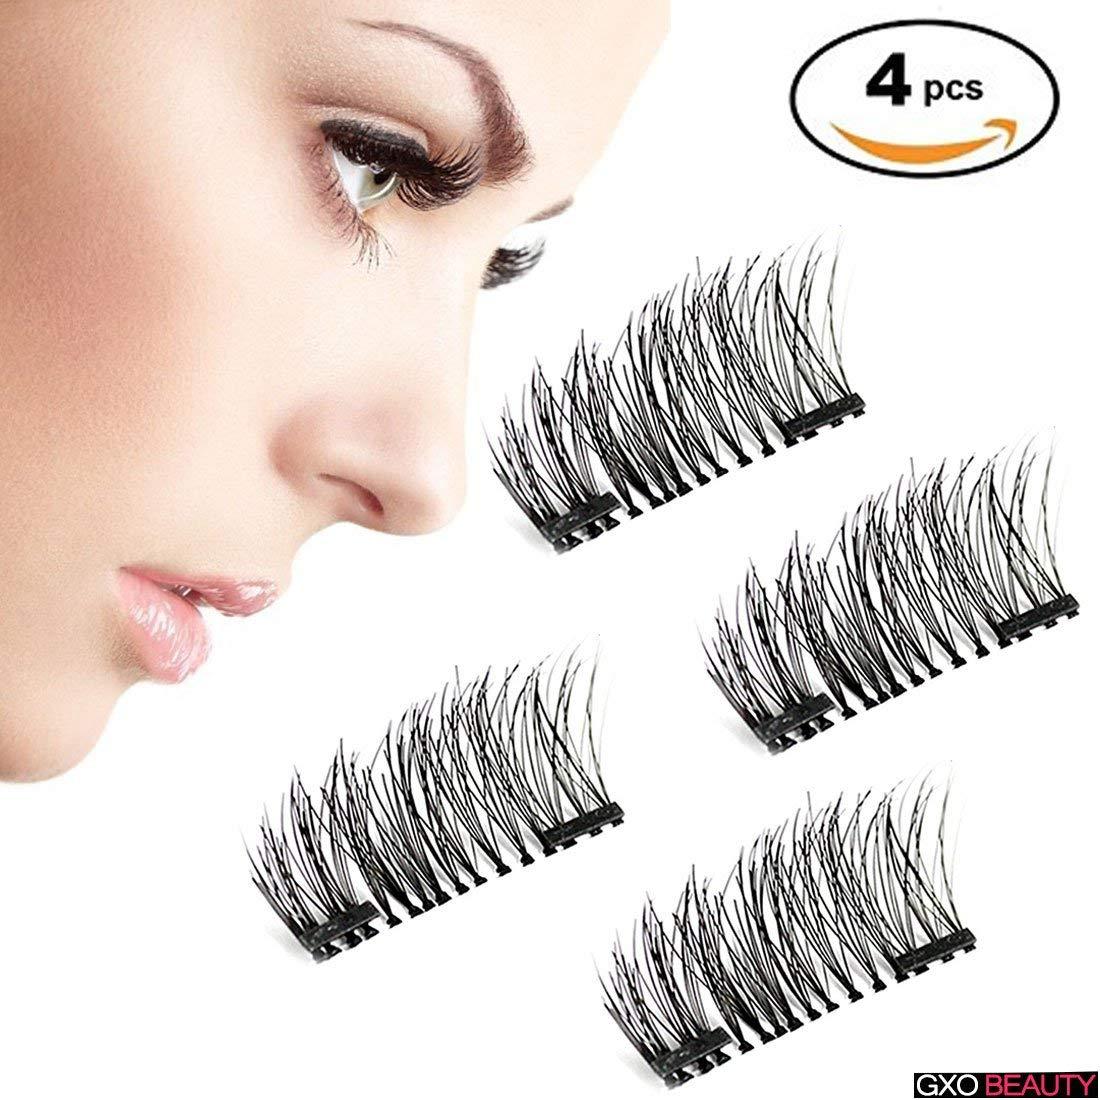 791b05cf63a Get Quotations · Magnetic 3D False Eyelashes False Lashes Hand-made Fake  Eyelashes Thicker Natural & Reusable 1